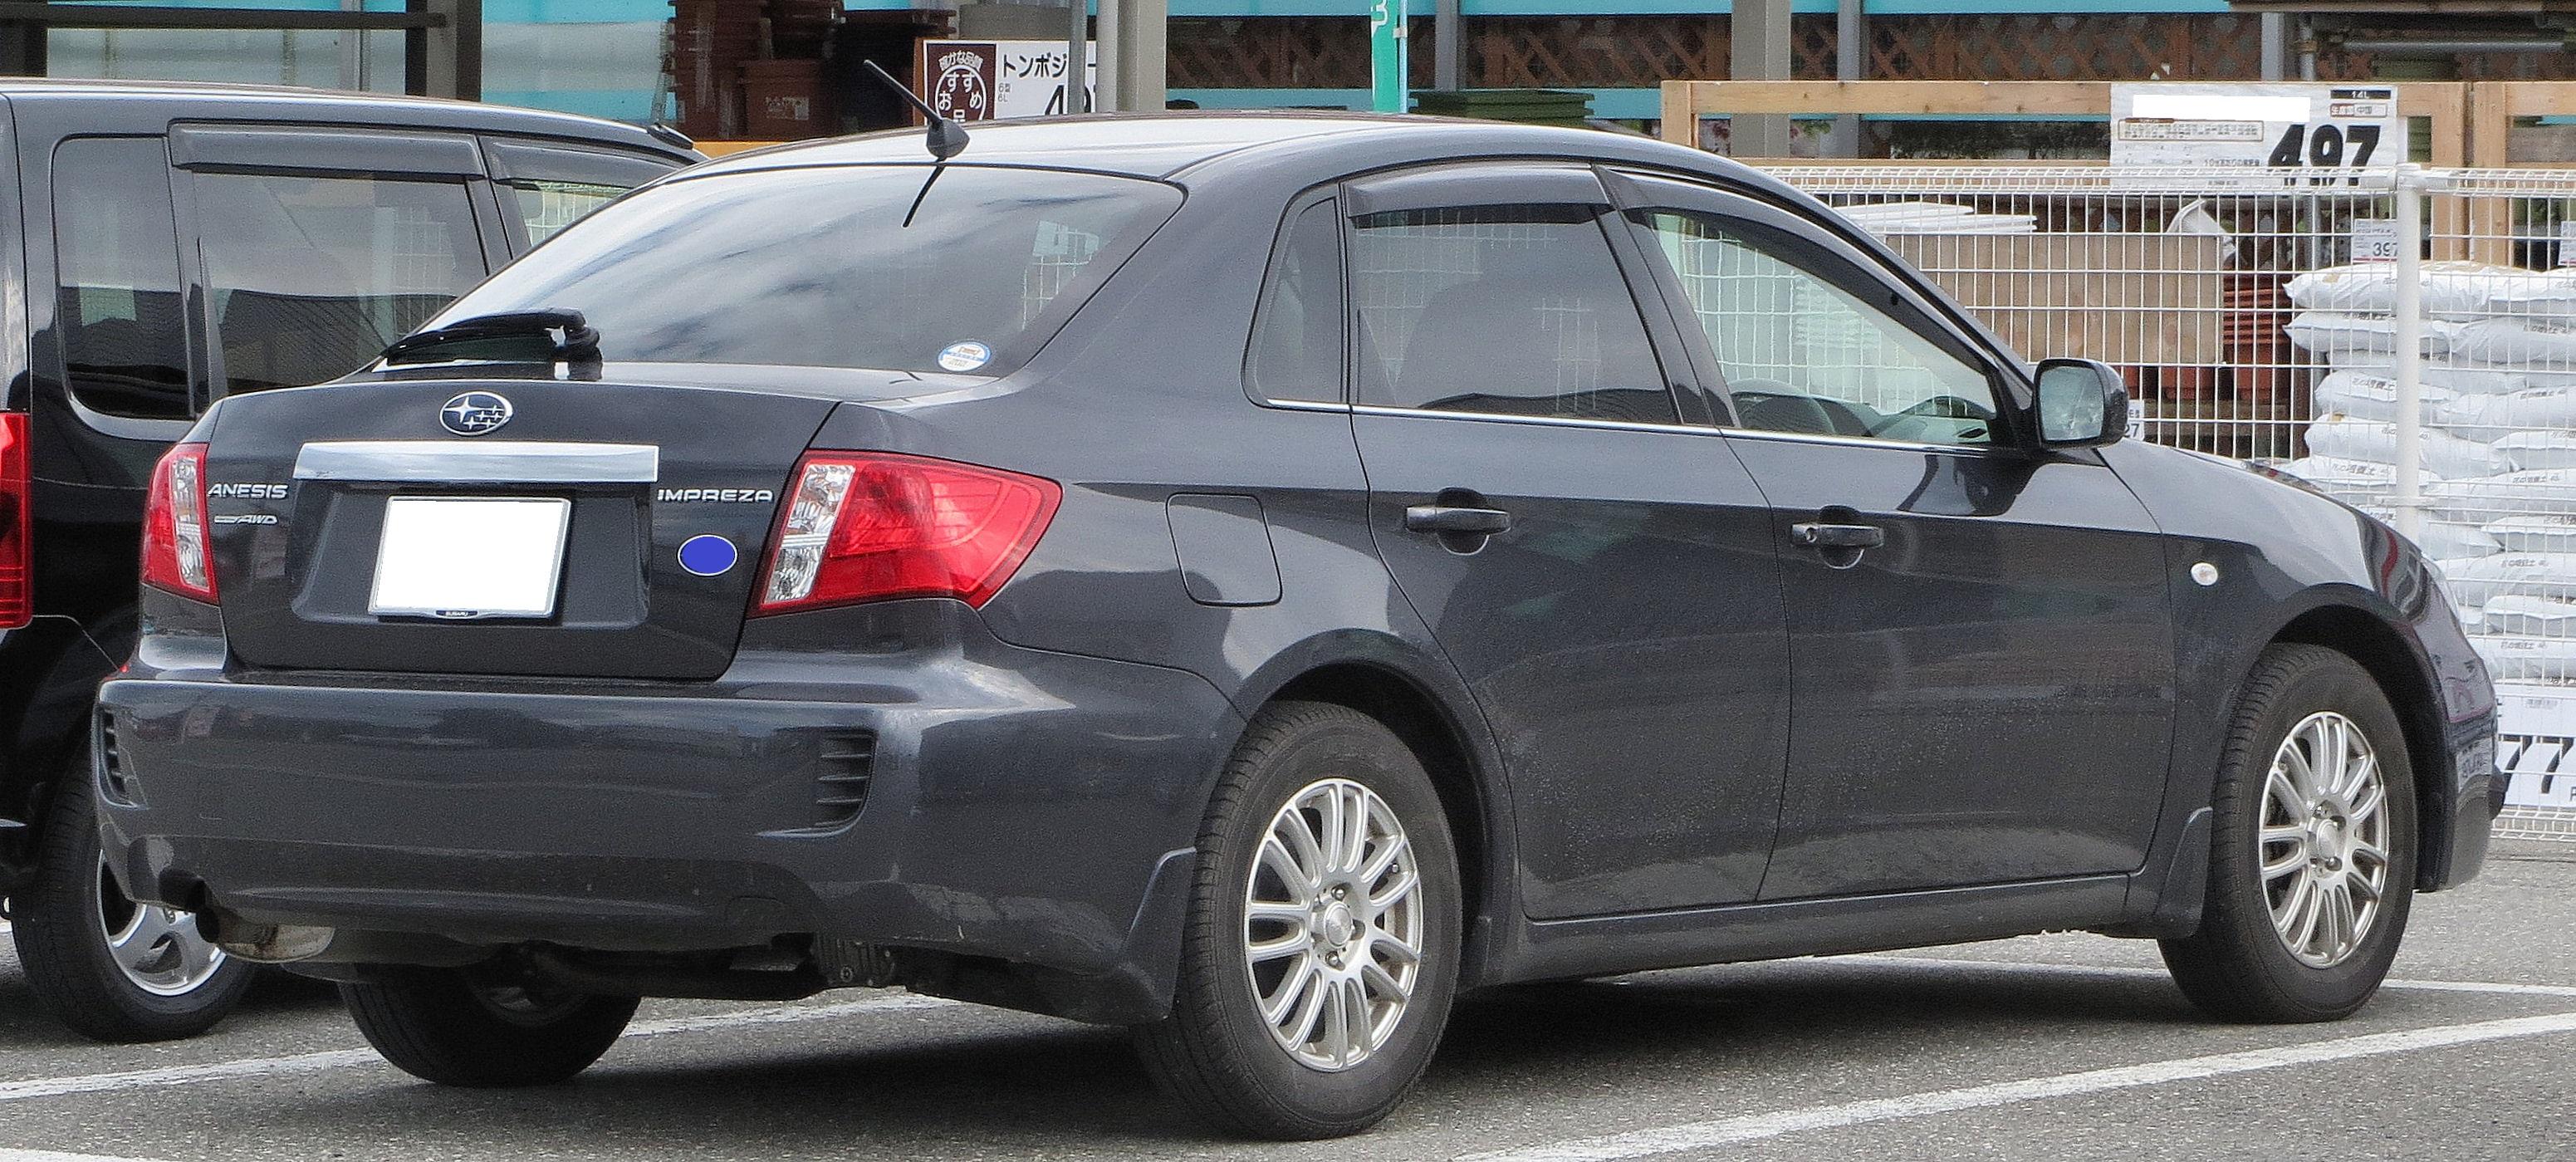 File Subaru Impreza Anesis 1 5i L Awd Rear Jpg Wikimedia